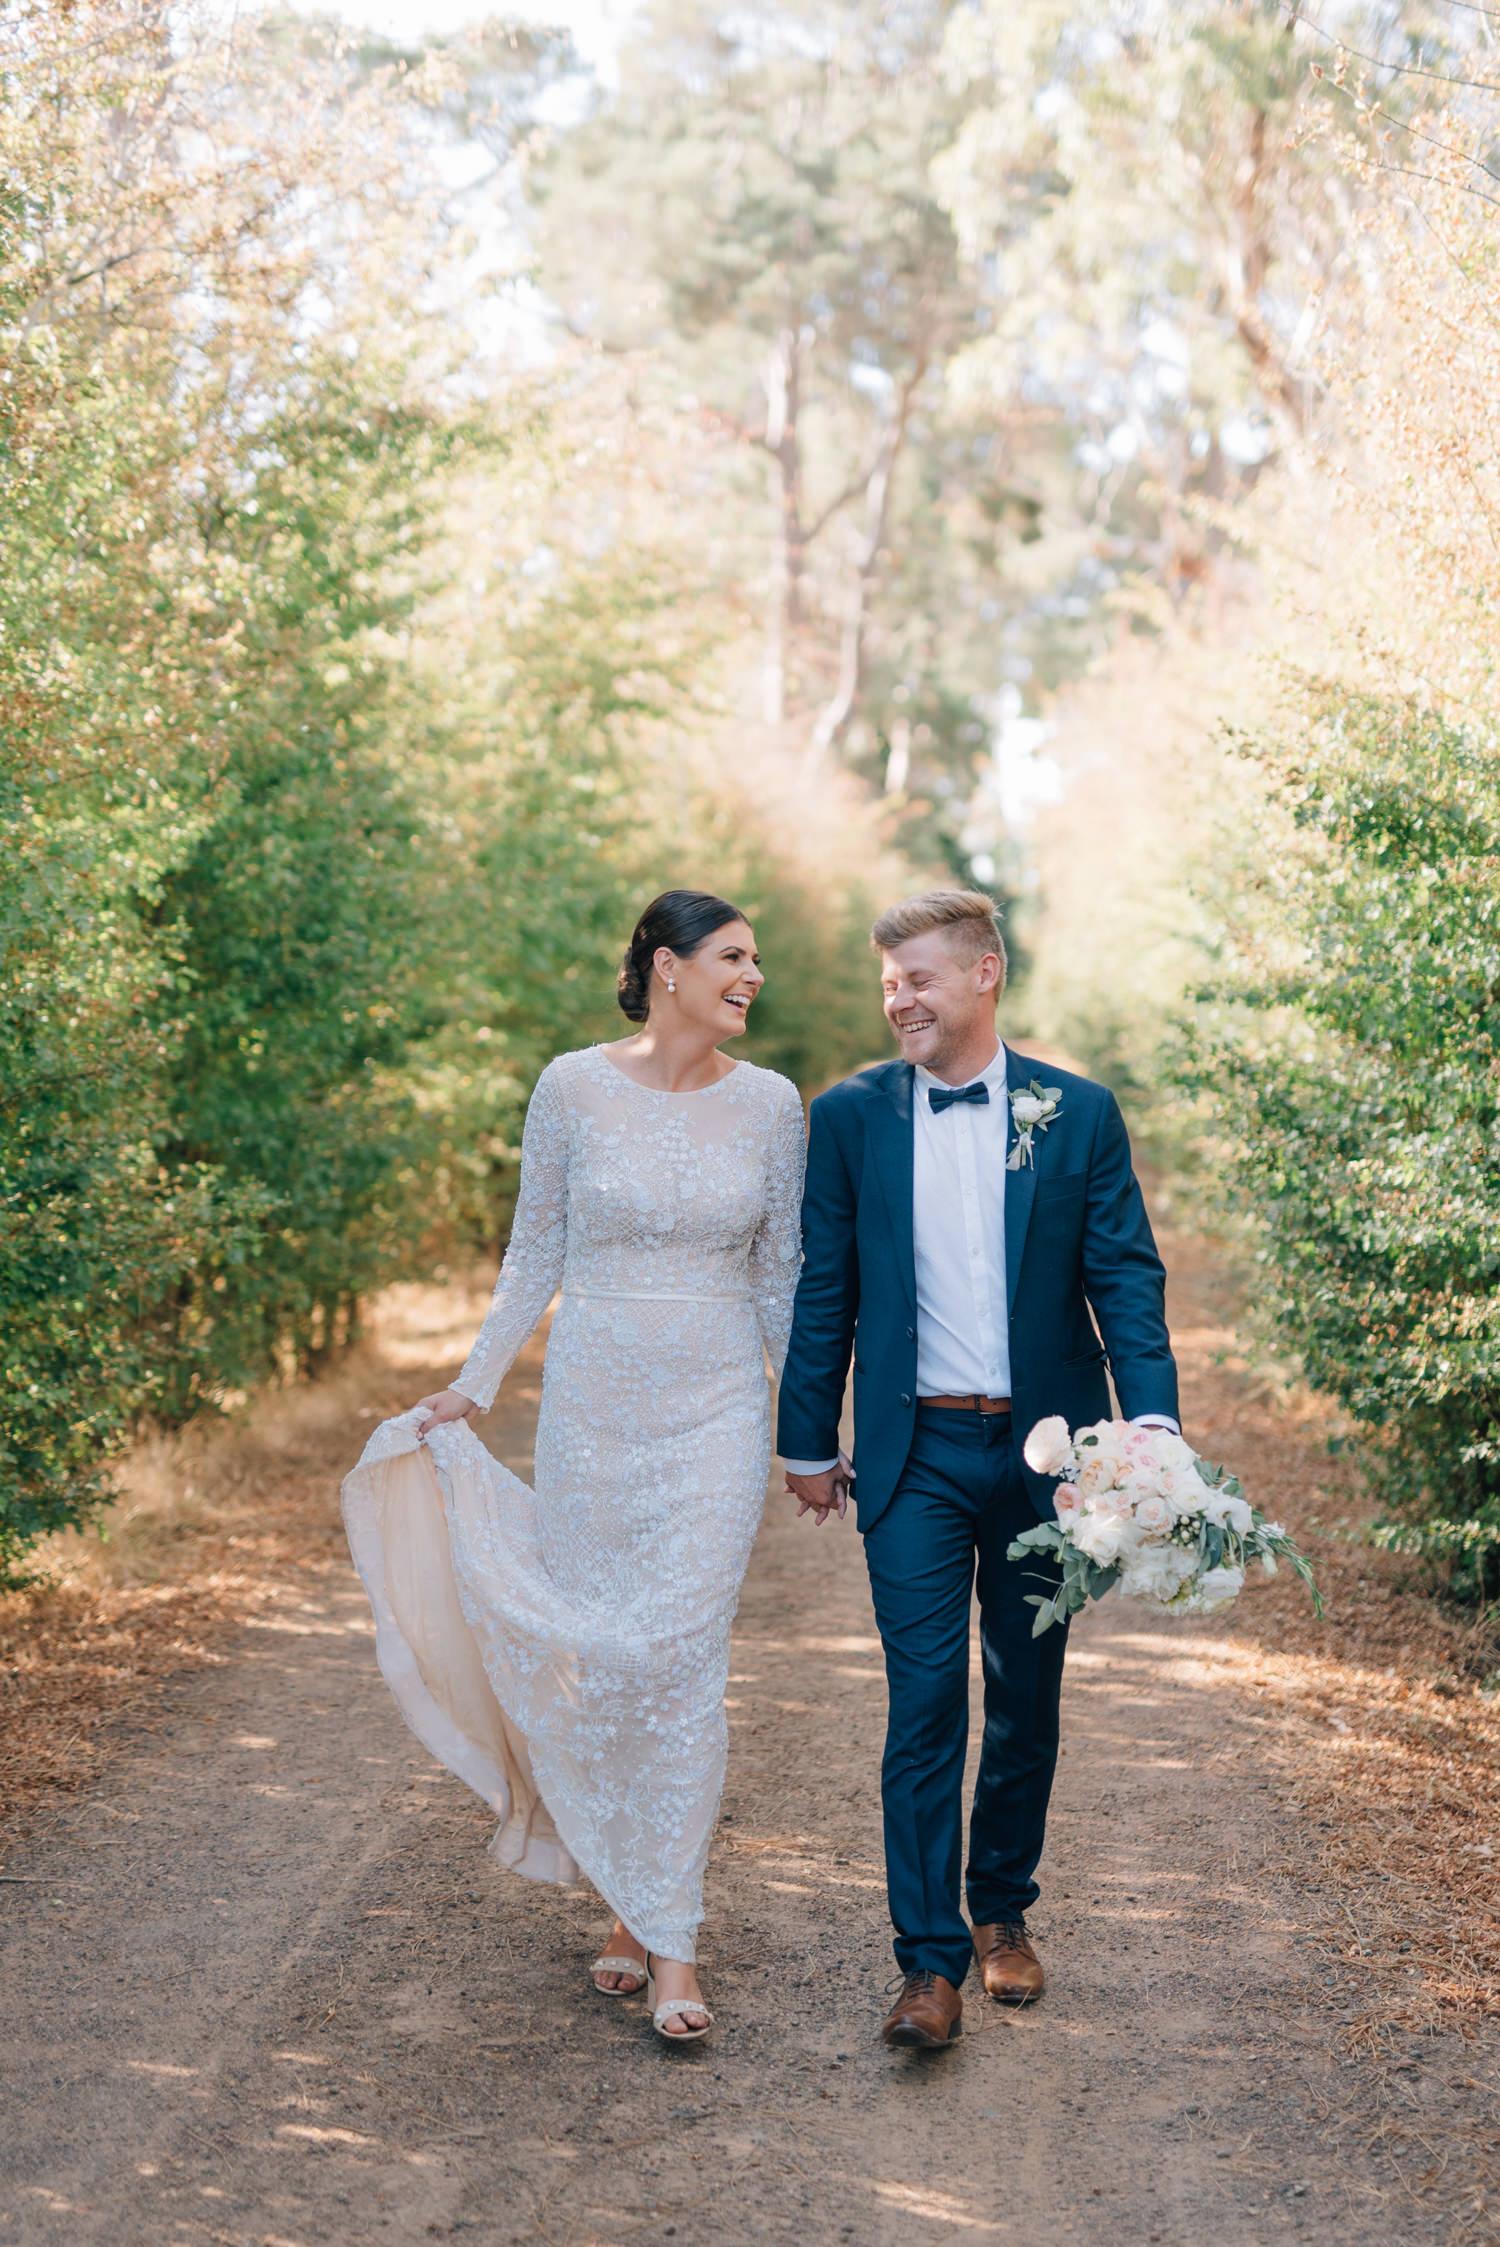 Quamby-Wedding-Photography-98.jpg